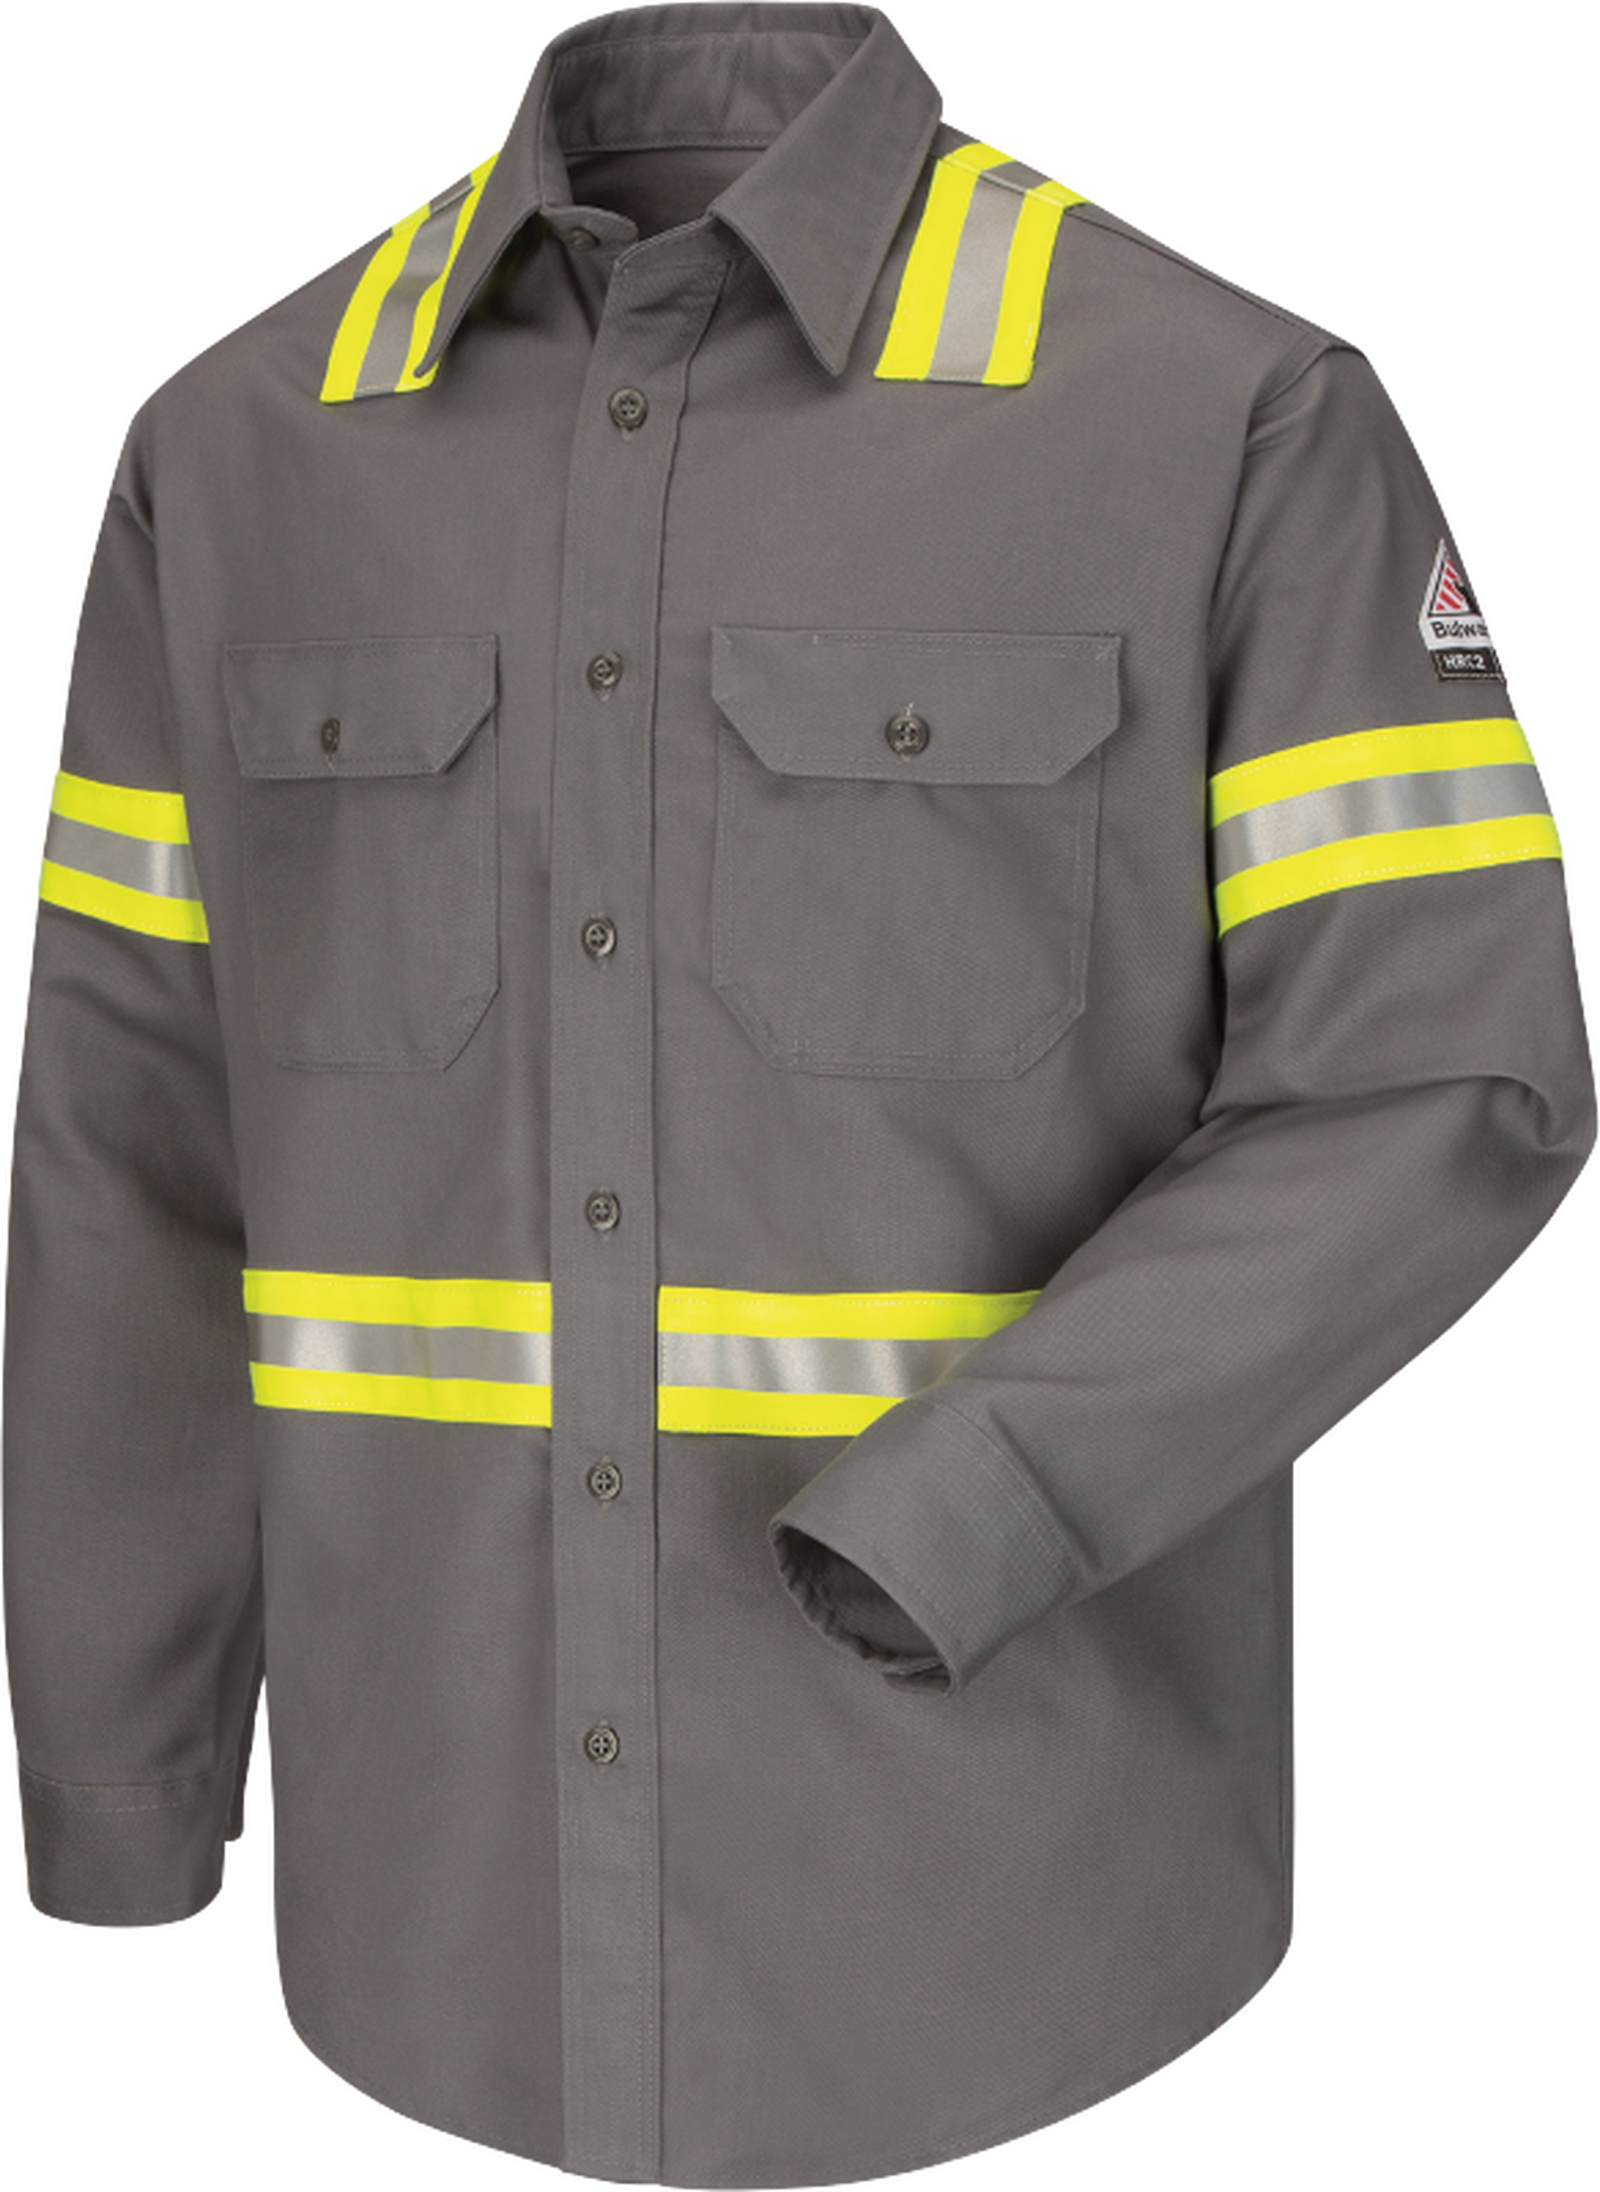 Men's Midweight FR Enhanced Visibility Uniform Shirt